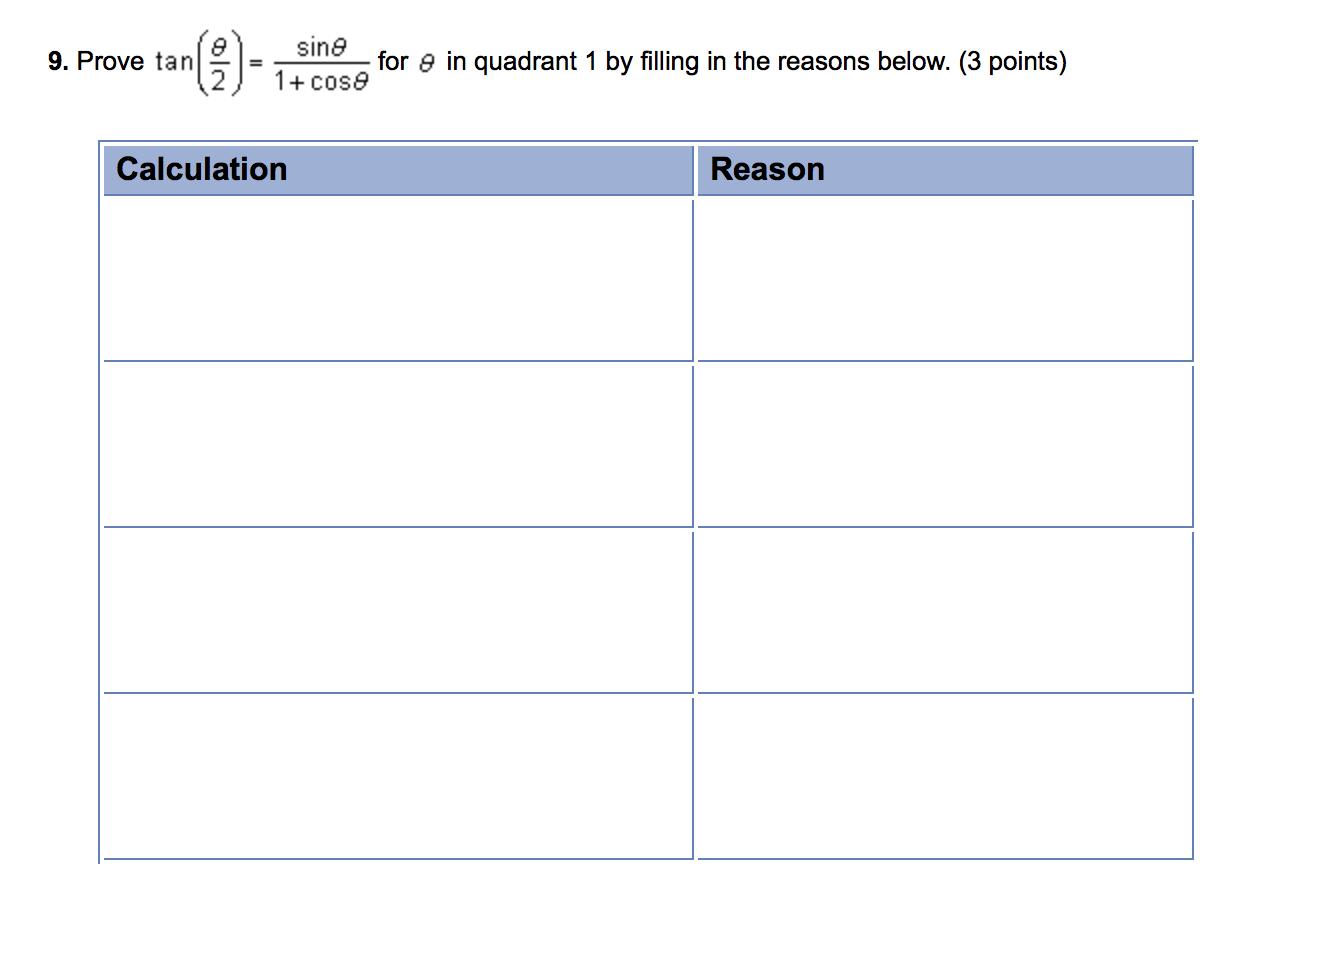 worksheet Quadrant 1 prove that tantheta2sin theta1cos theta for chegg com theta